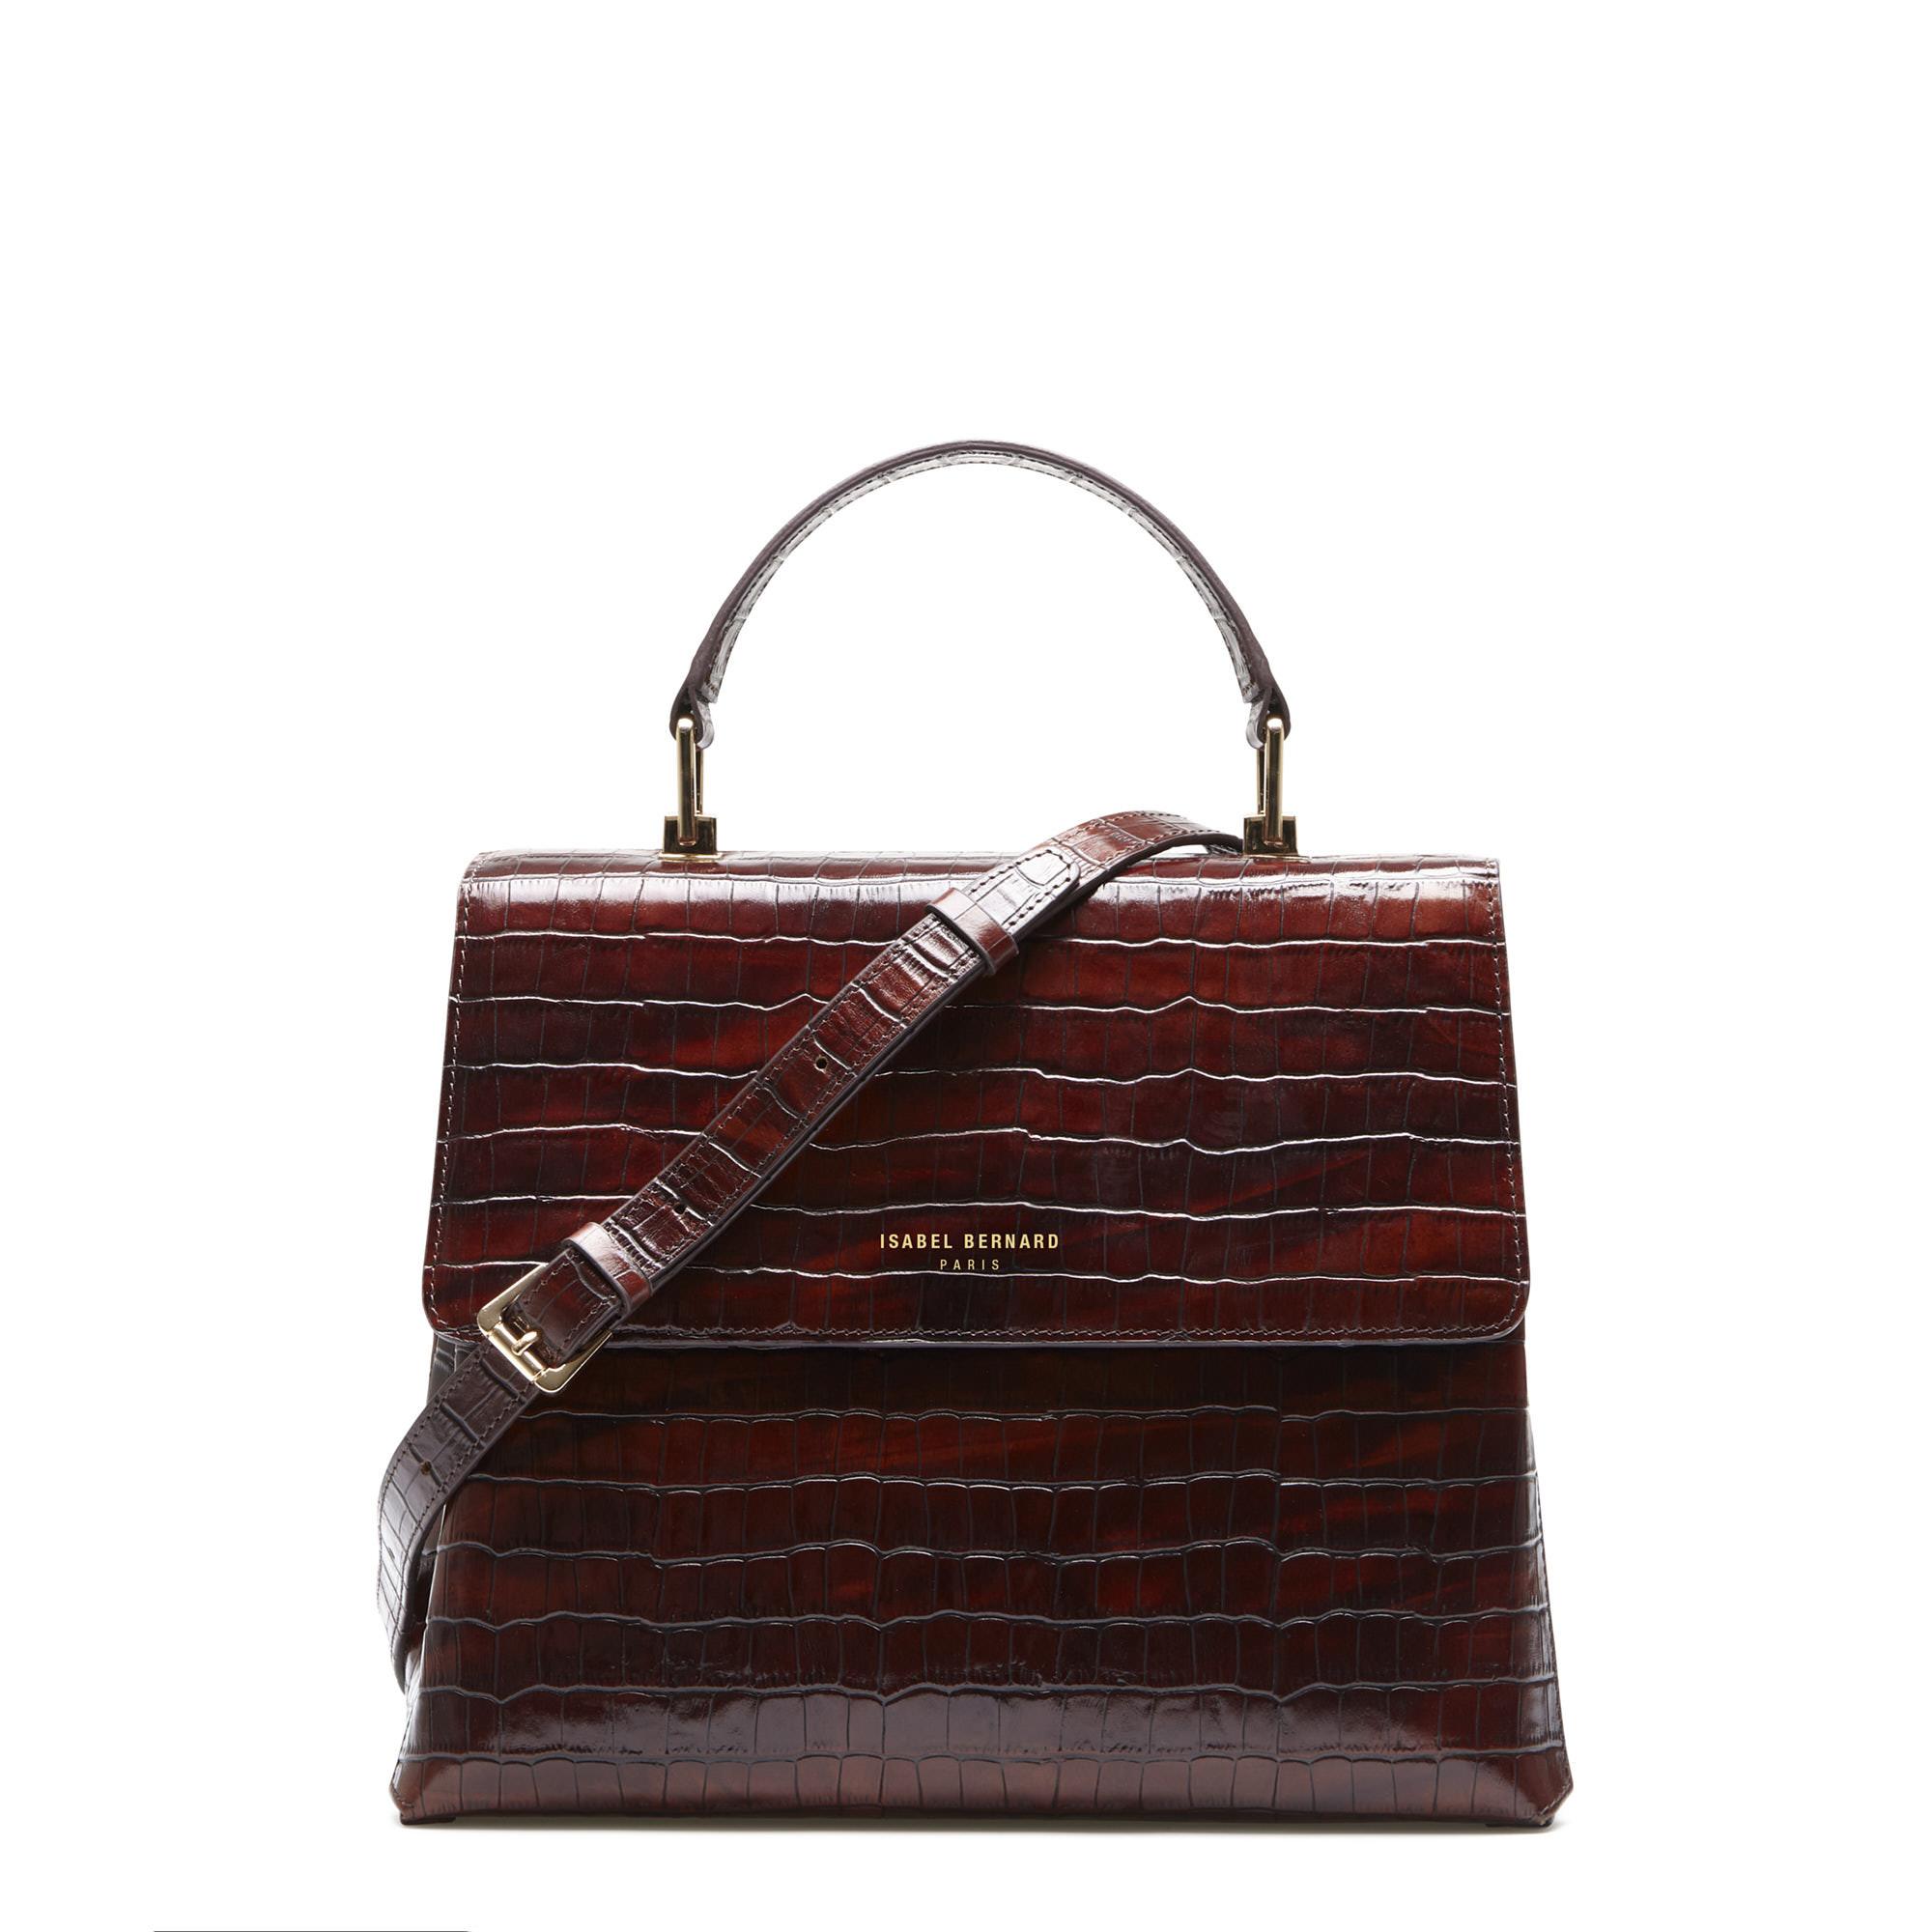 Isabel Bernard Femme Forte Gisel croco brun läder handväska av kalvskinn